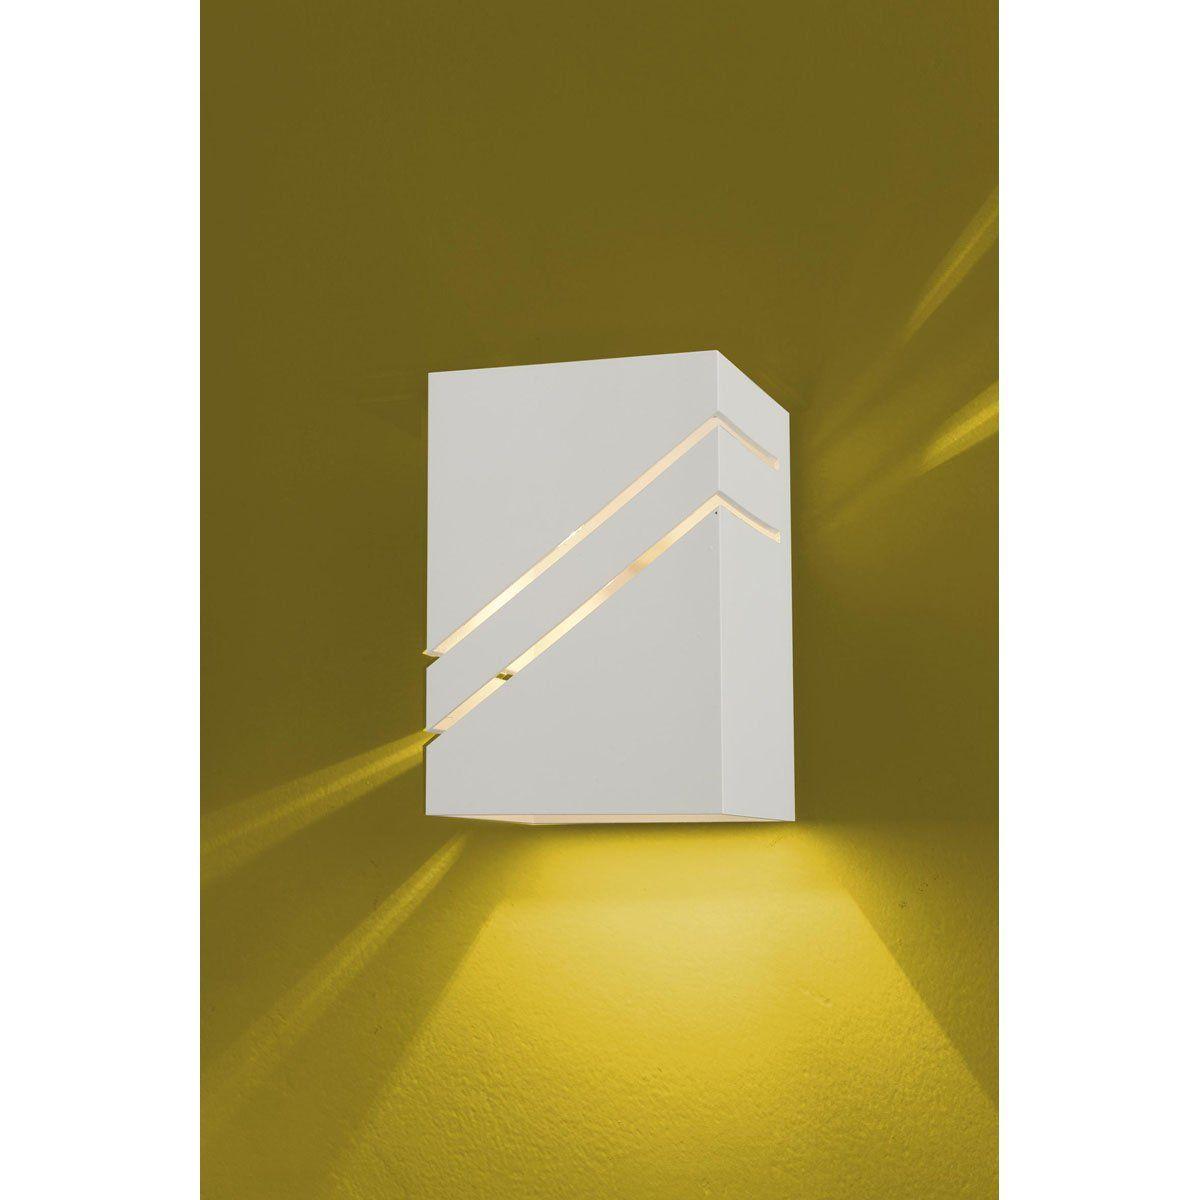 Arandela Flash tubo quadrada 02L Diagonal 01 GU9 Tampa Alumínio - Branco